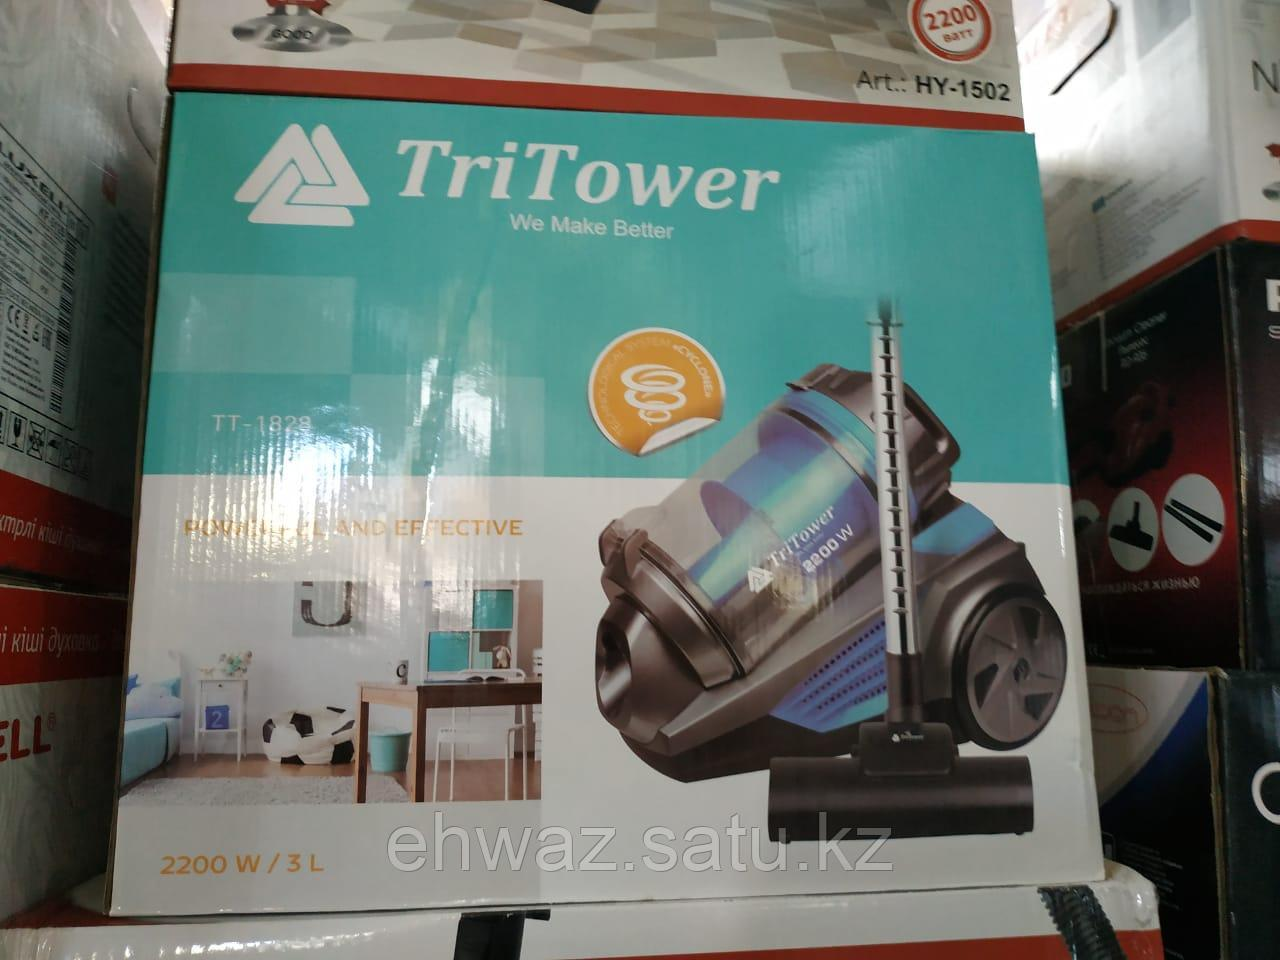 Пылесос TriTower 2200w